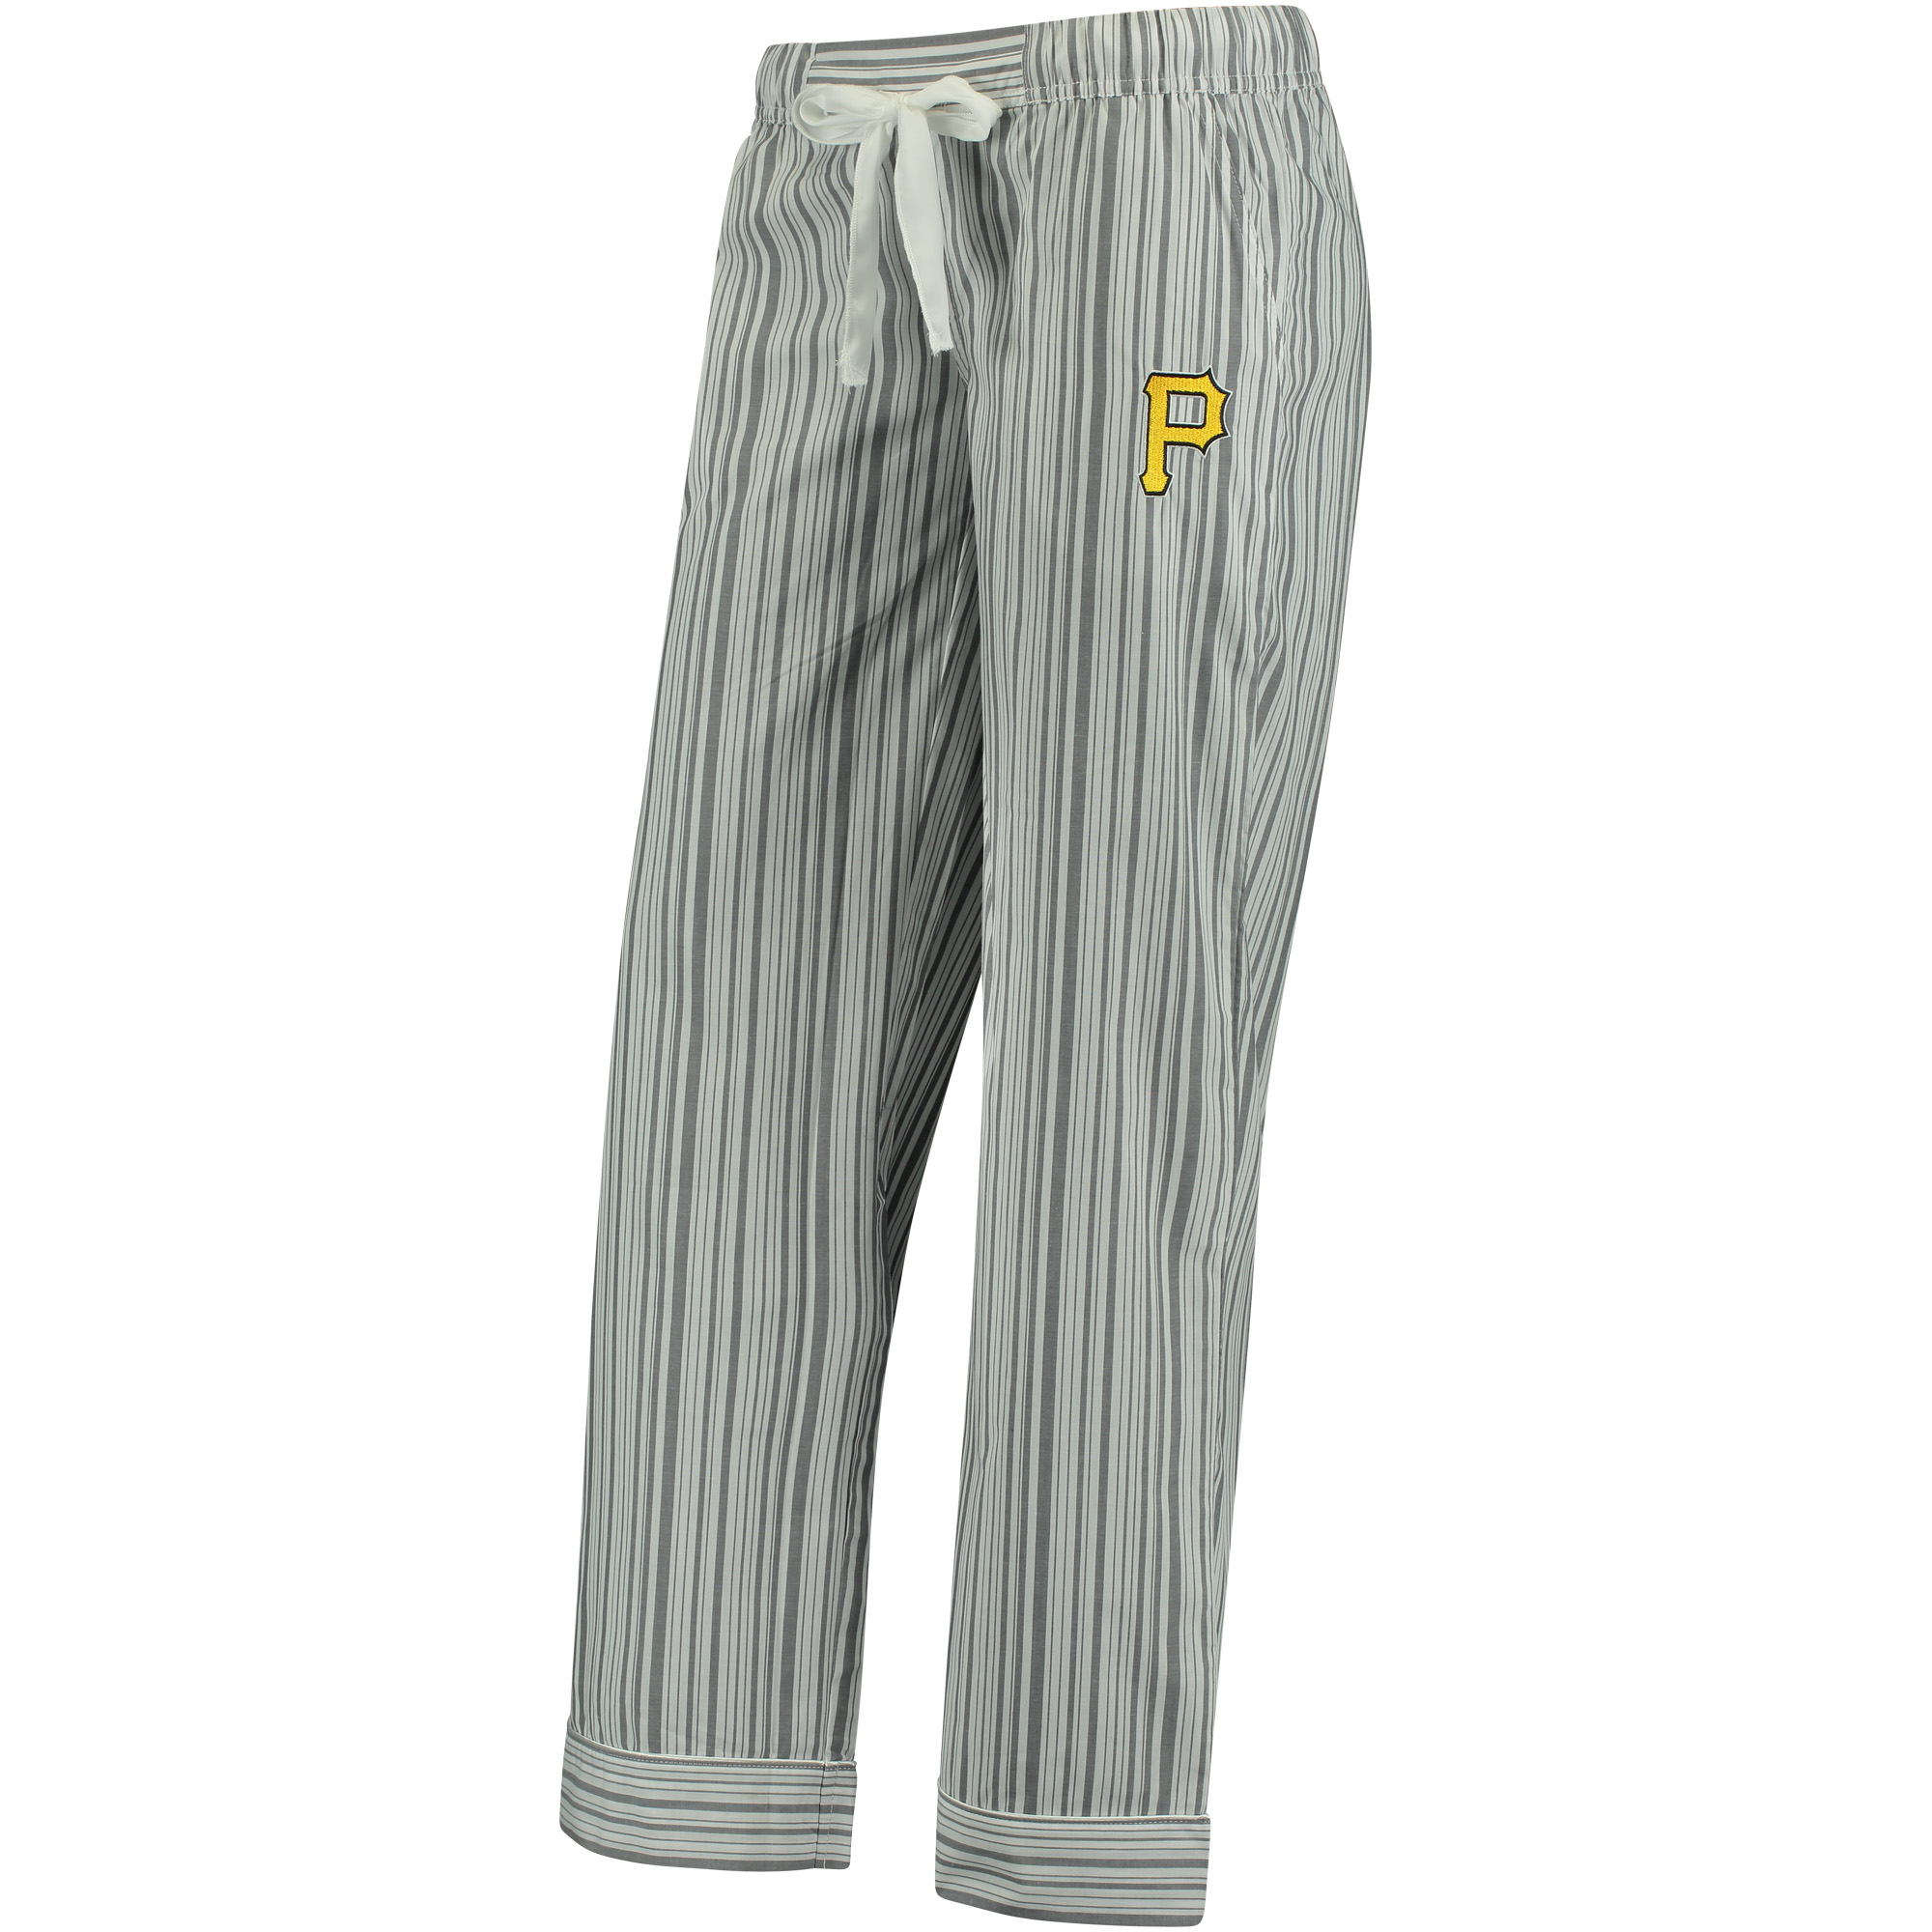 Pittsburgh Pirates Concepts Sport Women's Principle Woven Lounge Pants - Charcoal/White